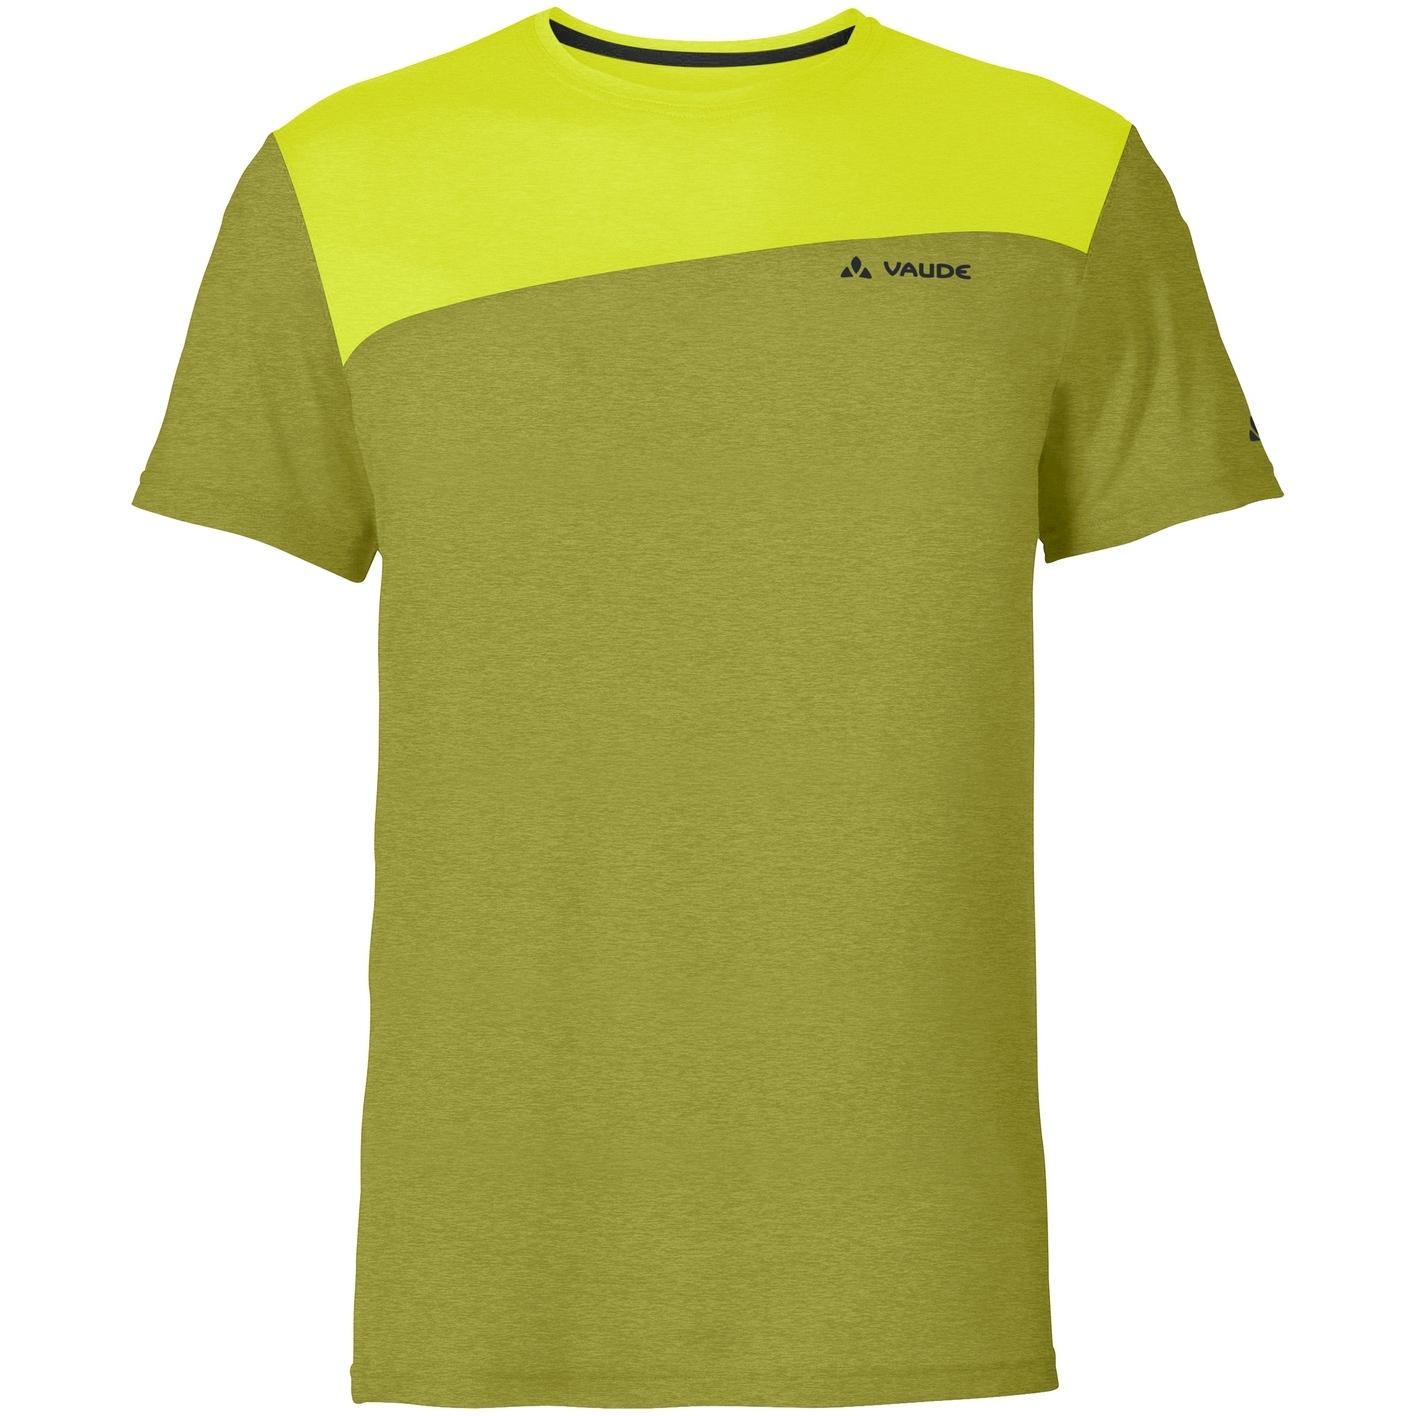 Vaude Sveit T-Shirt - avocado